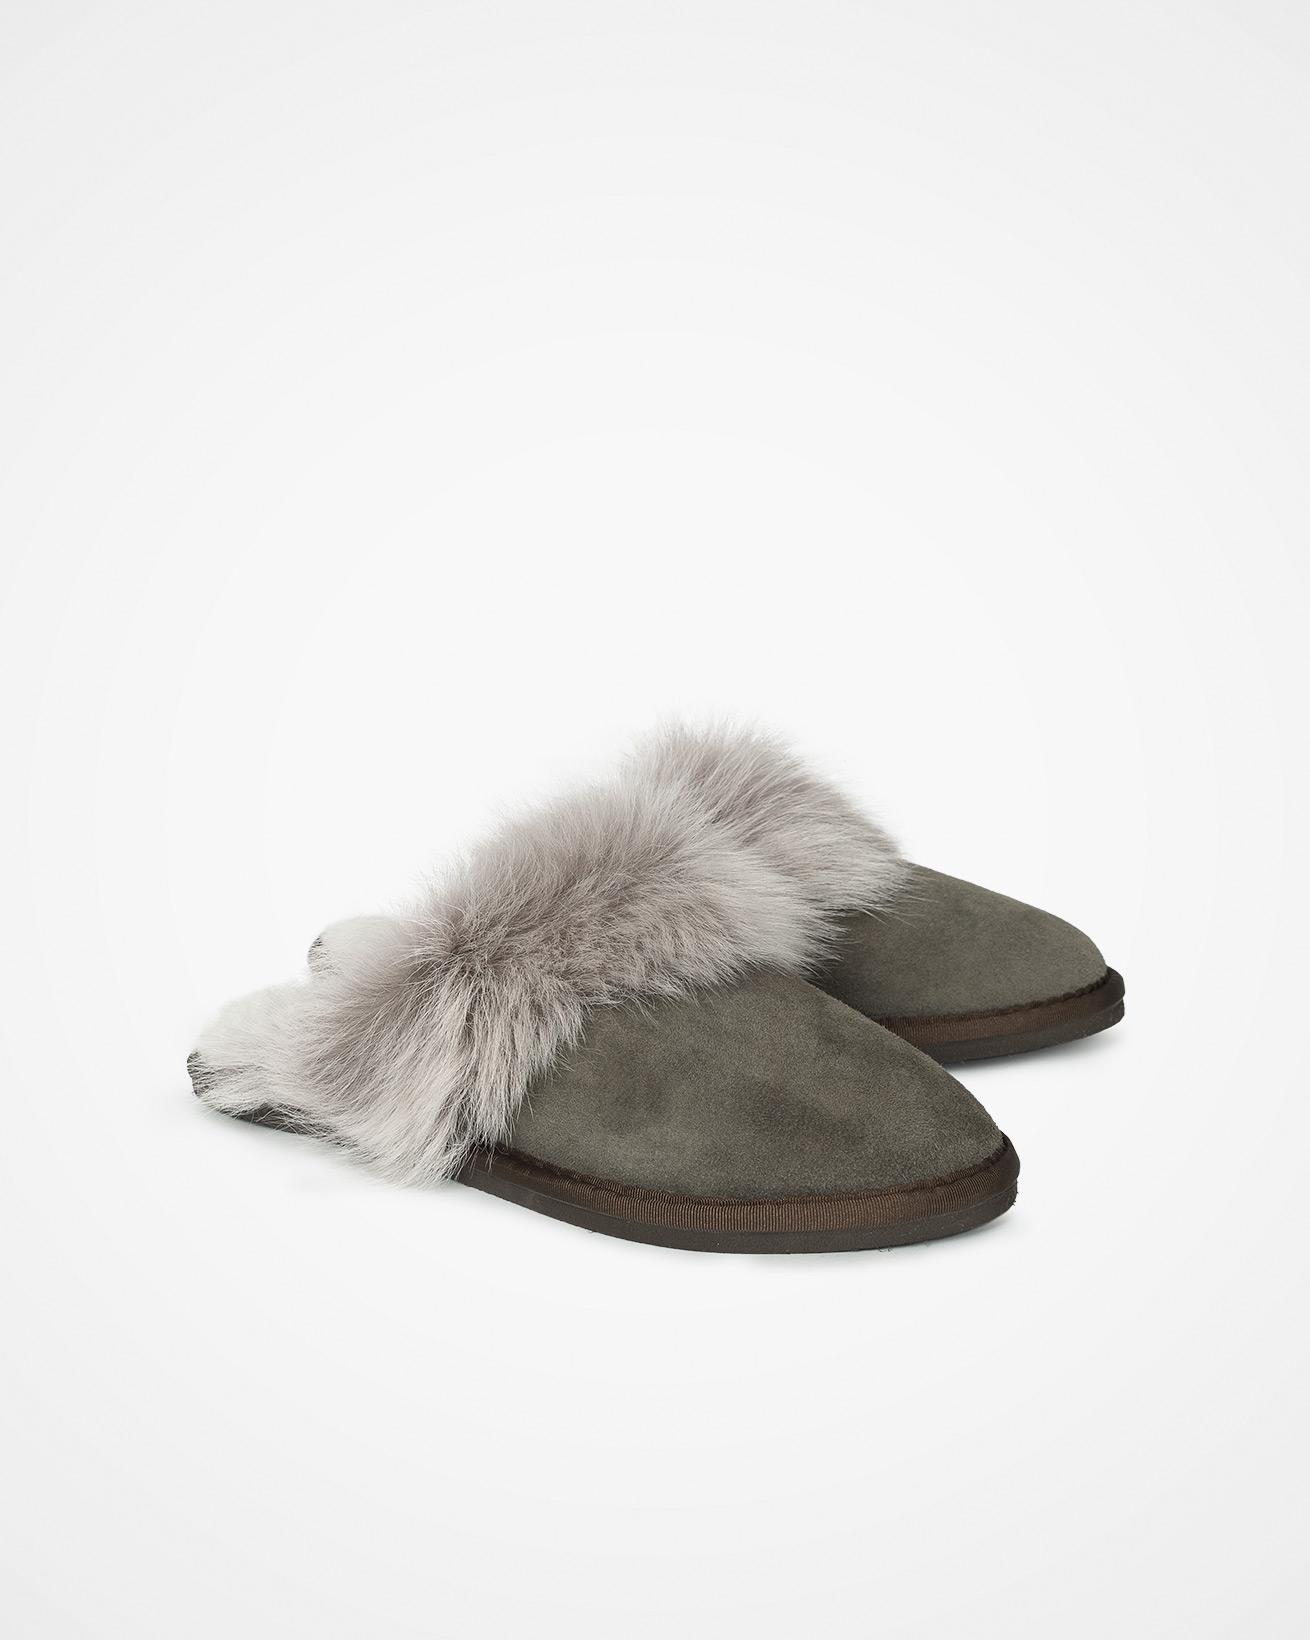 7769_tosacana-mule-slipper_vole_pair.jpg